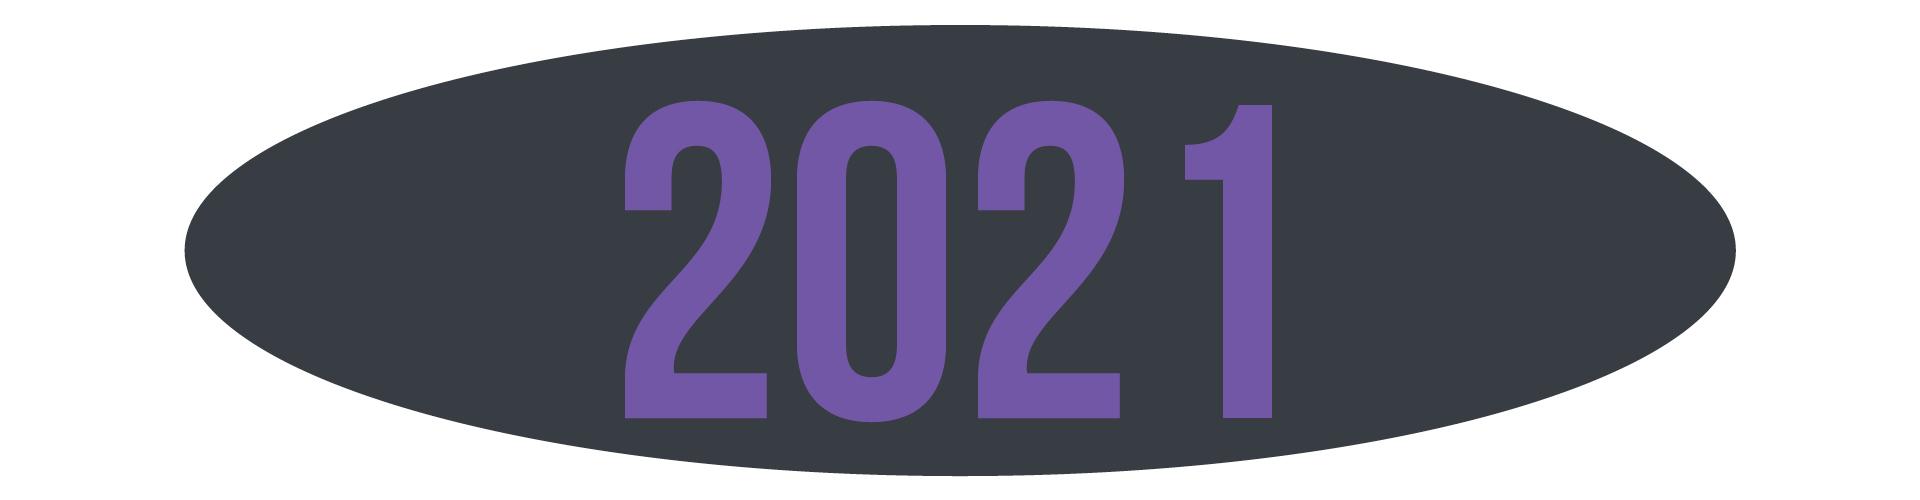 Banner 25